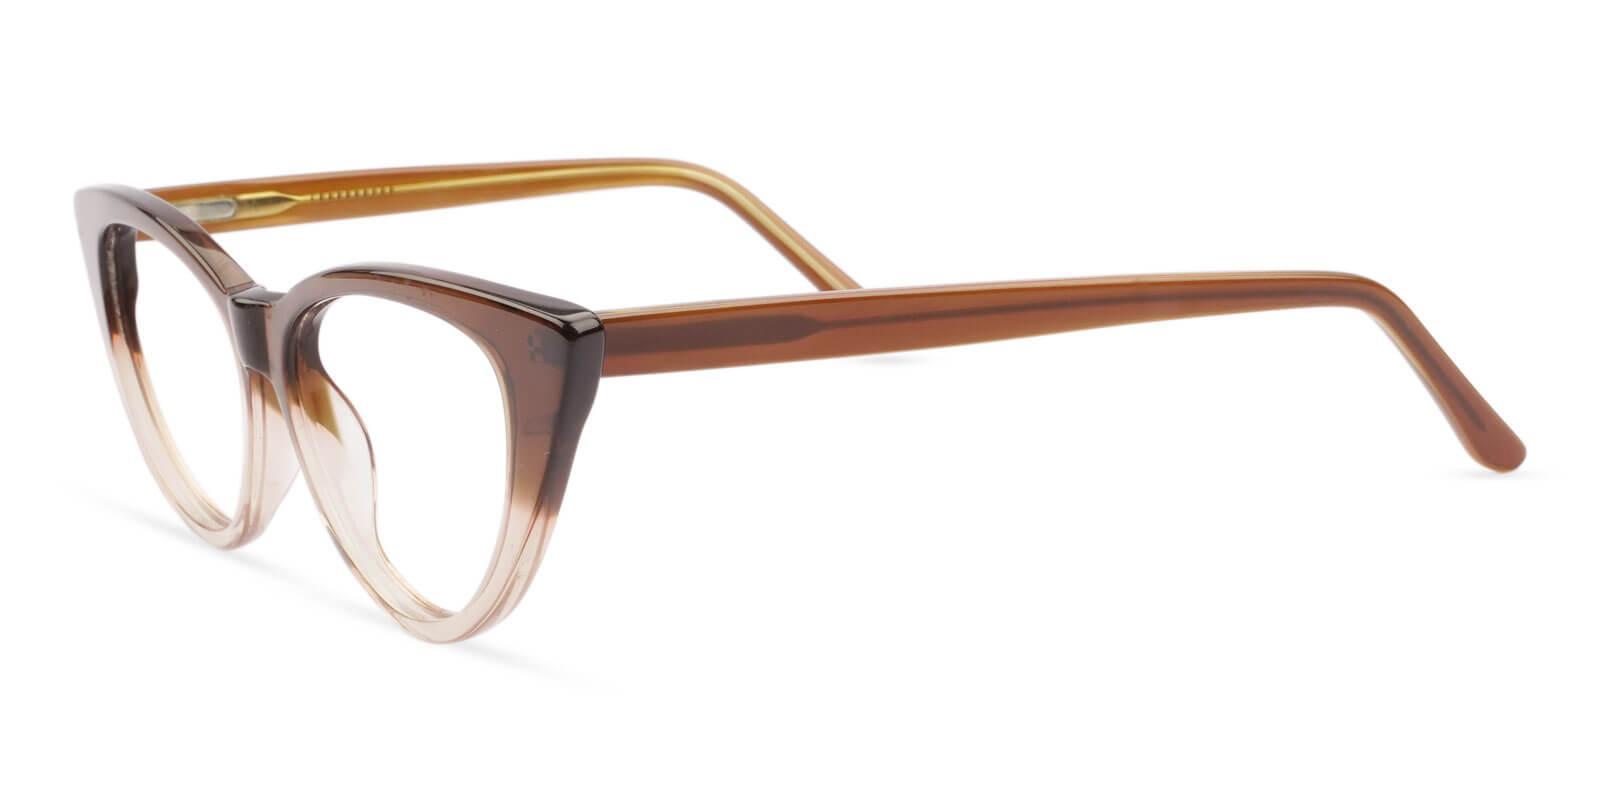 Nora Brown Acetate Eyeglasses , SpringHinges , UniversalBridgeFit Frames from ABBE Glasses